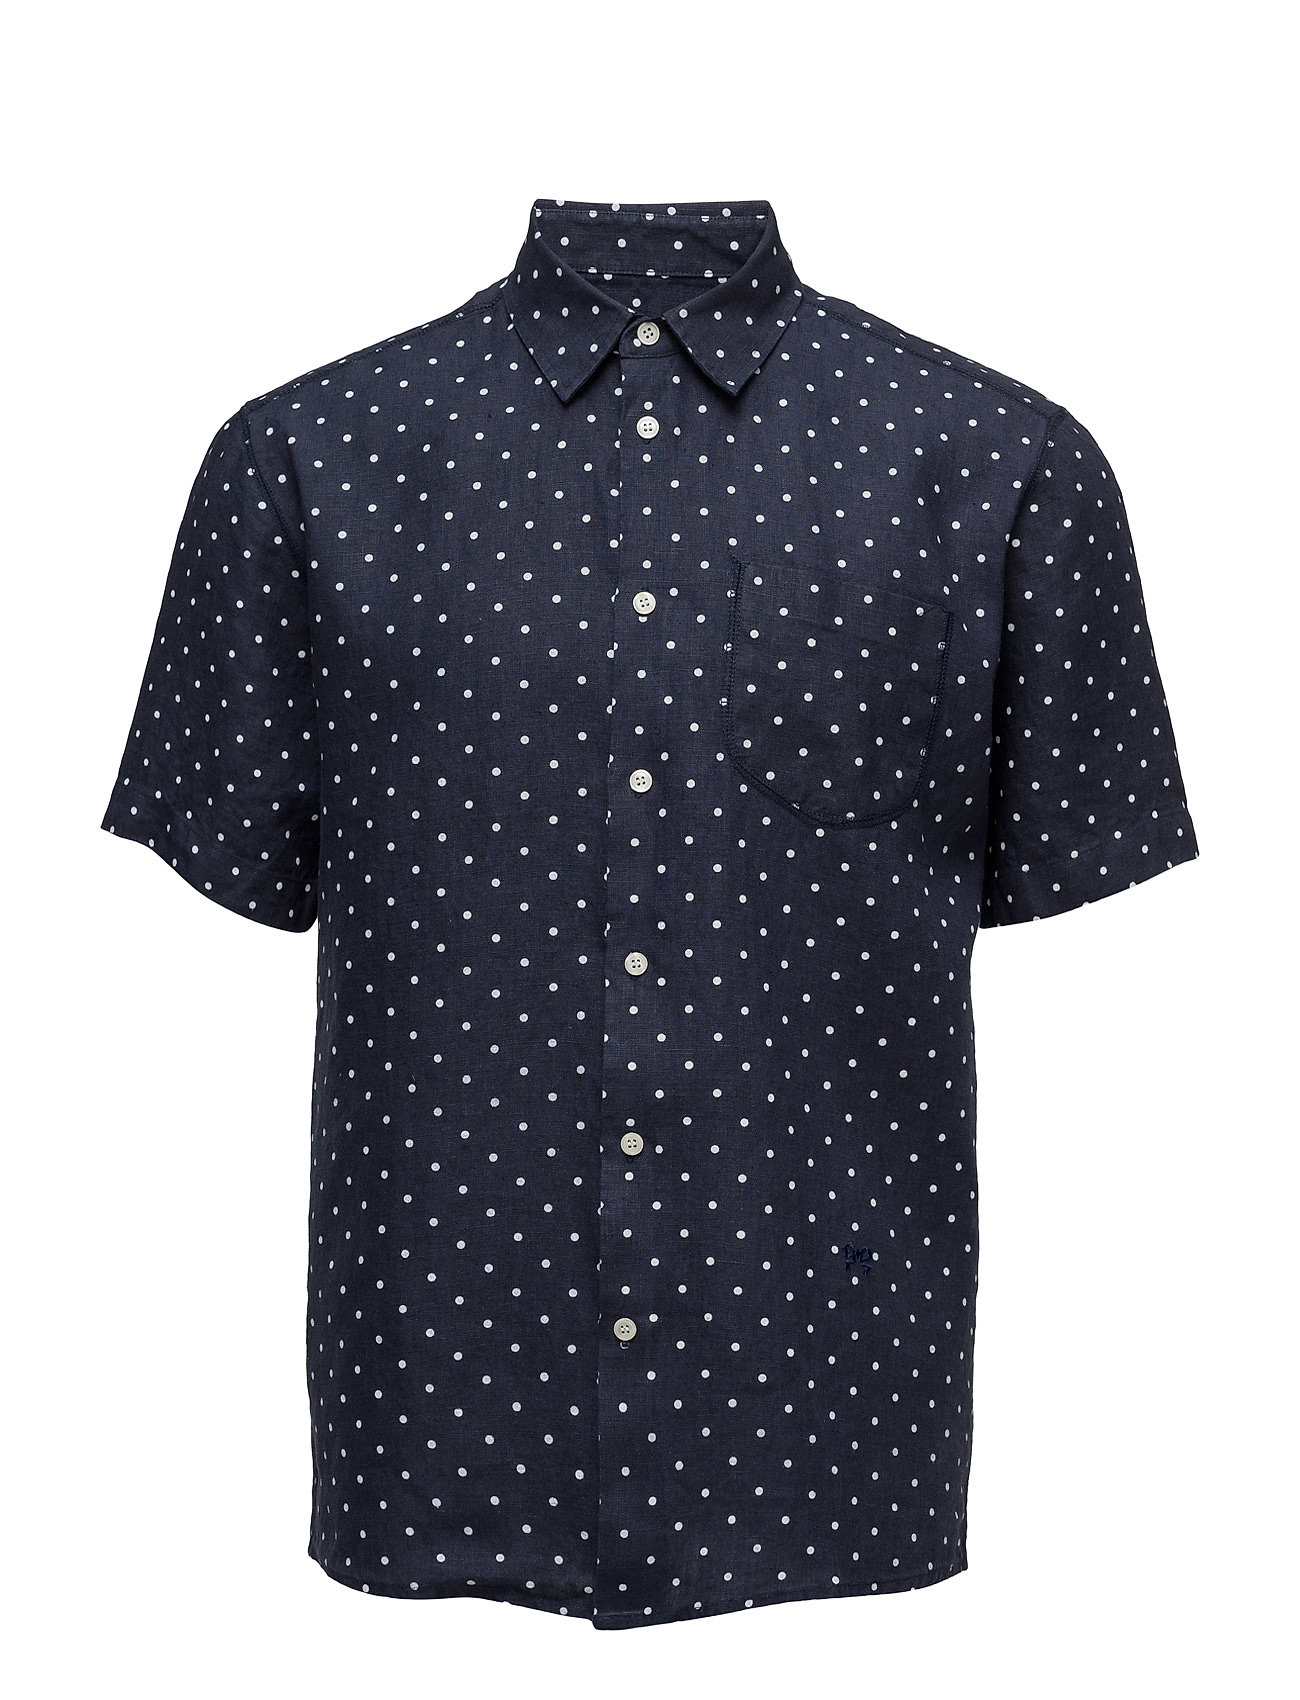 Bottoms Short Sleeve Shirt W. Pocket Soulland Kort-Hylsa